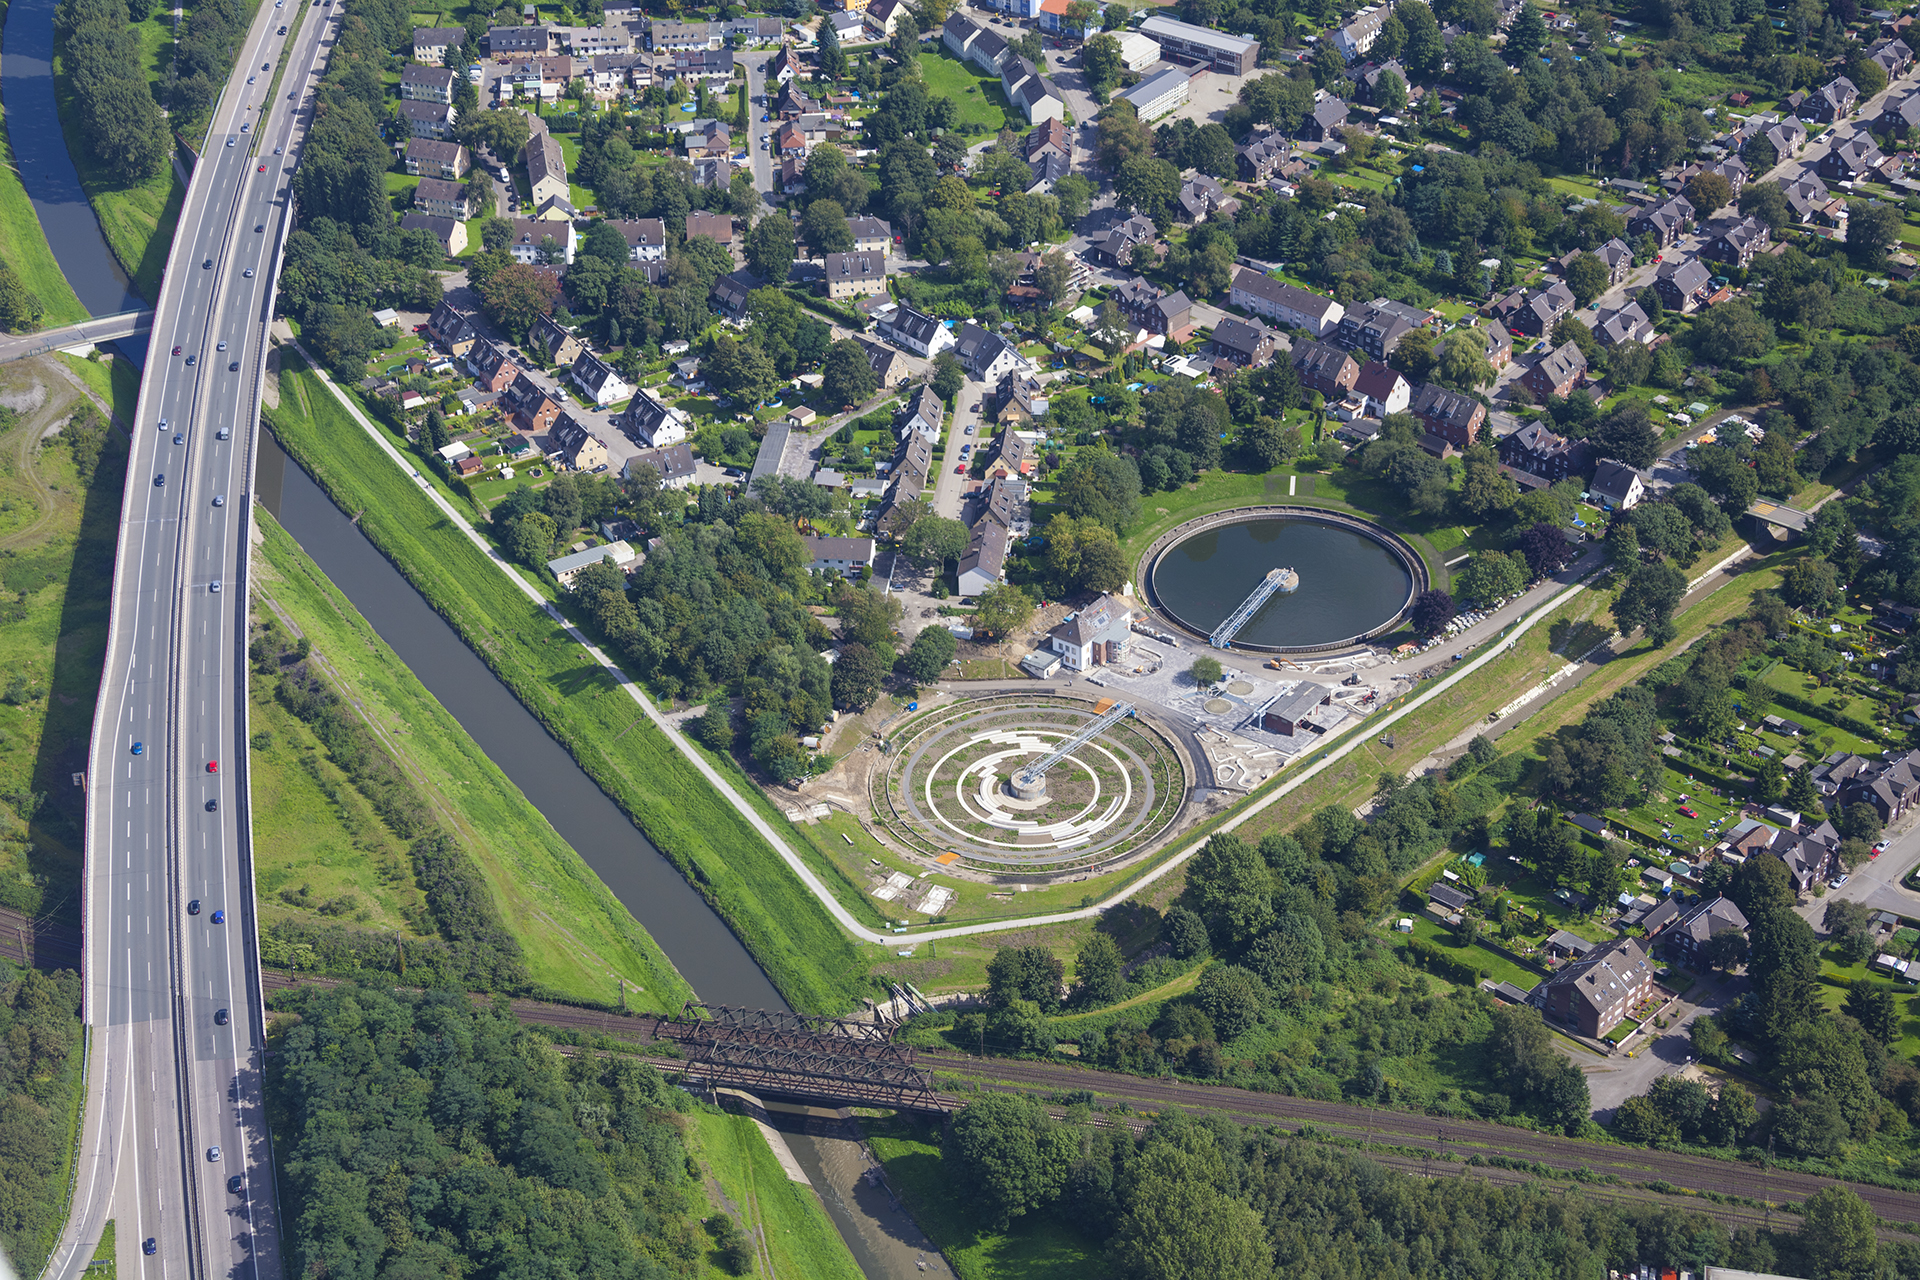 Bernepark Bottrop